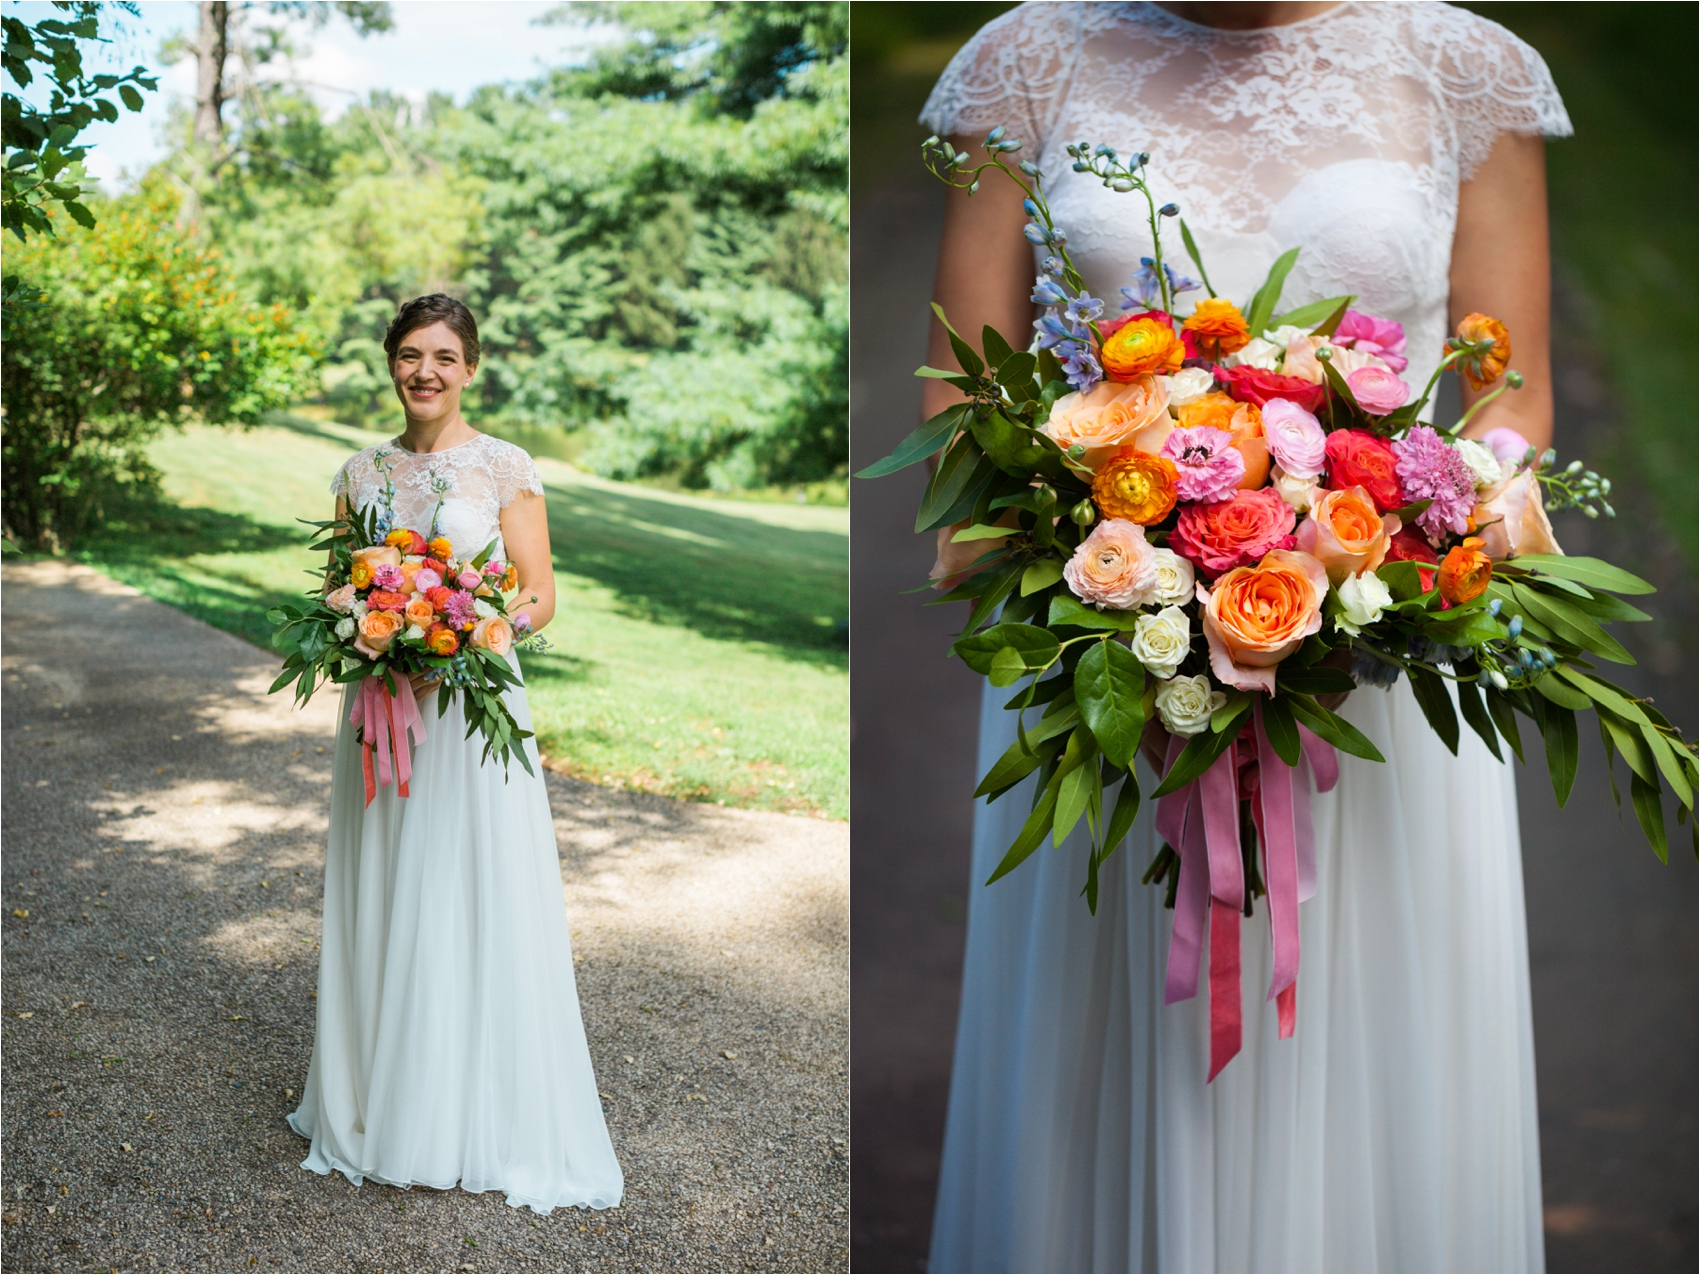 Feather-and-Oak-Rainforest-Trust-Virginia-Wedding-0093.jpg